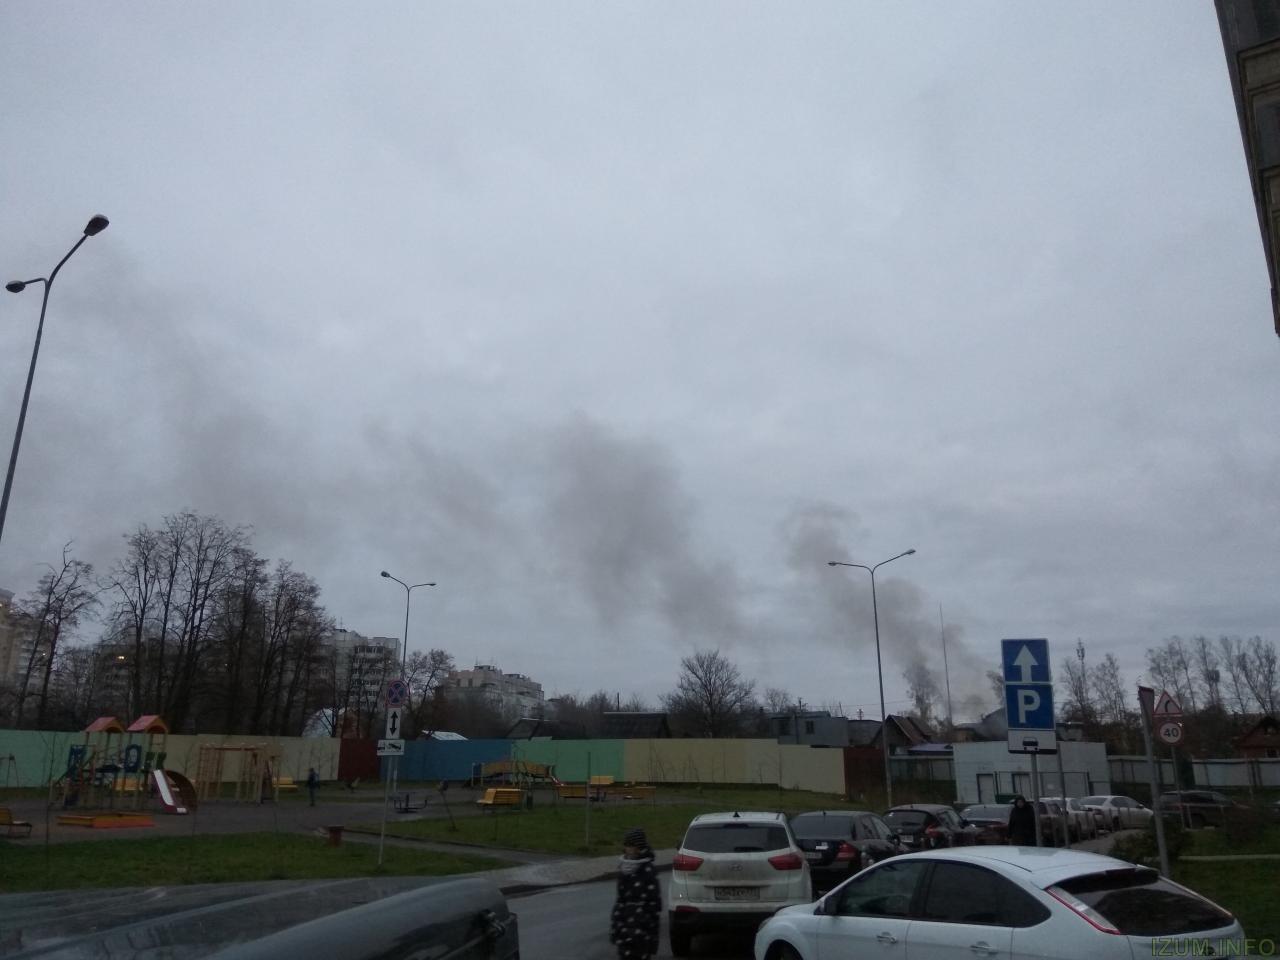 Изумрудные холмы в дыму (5).jpg